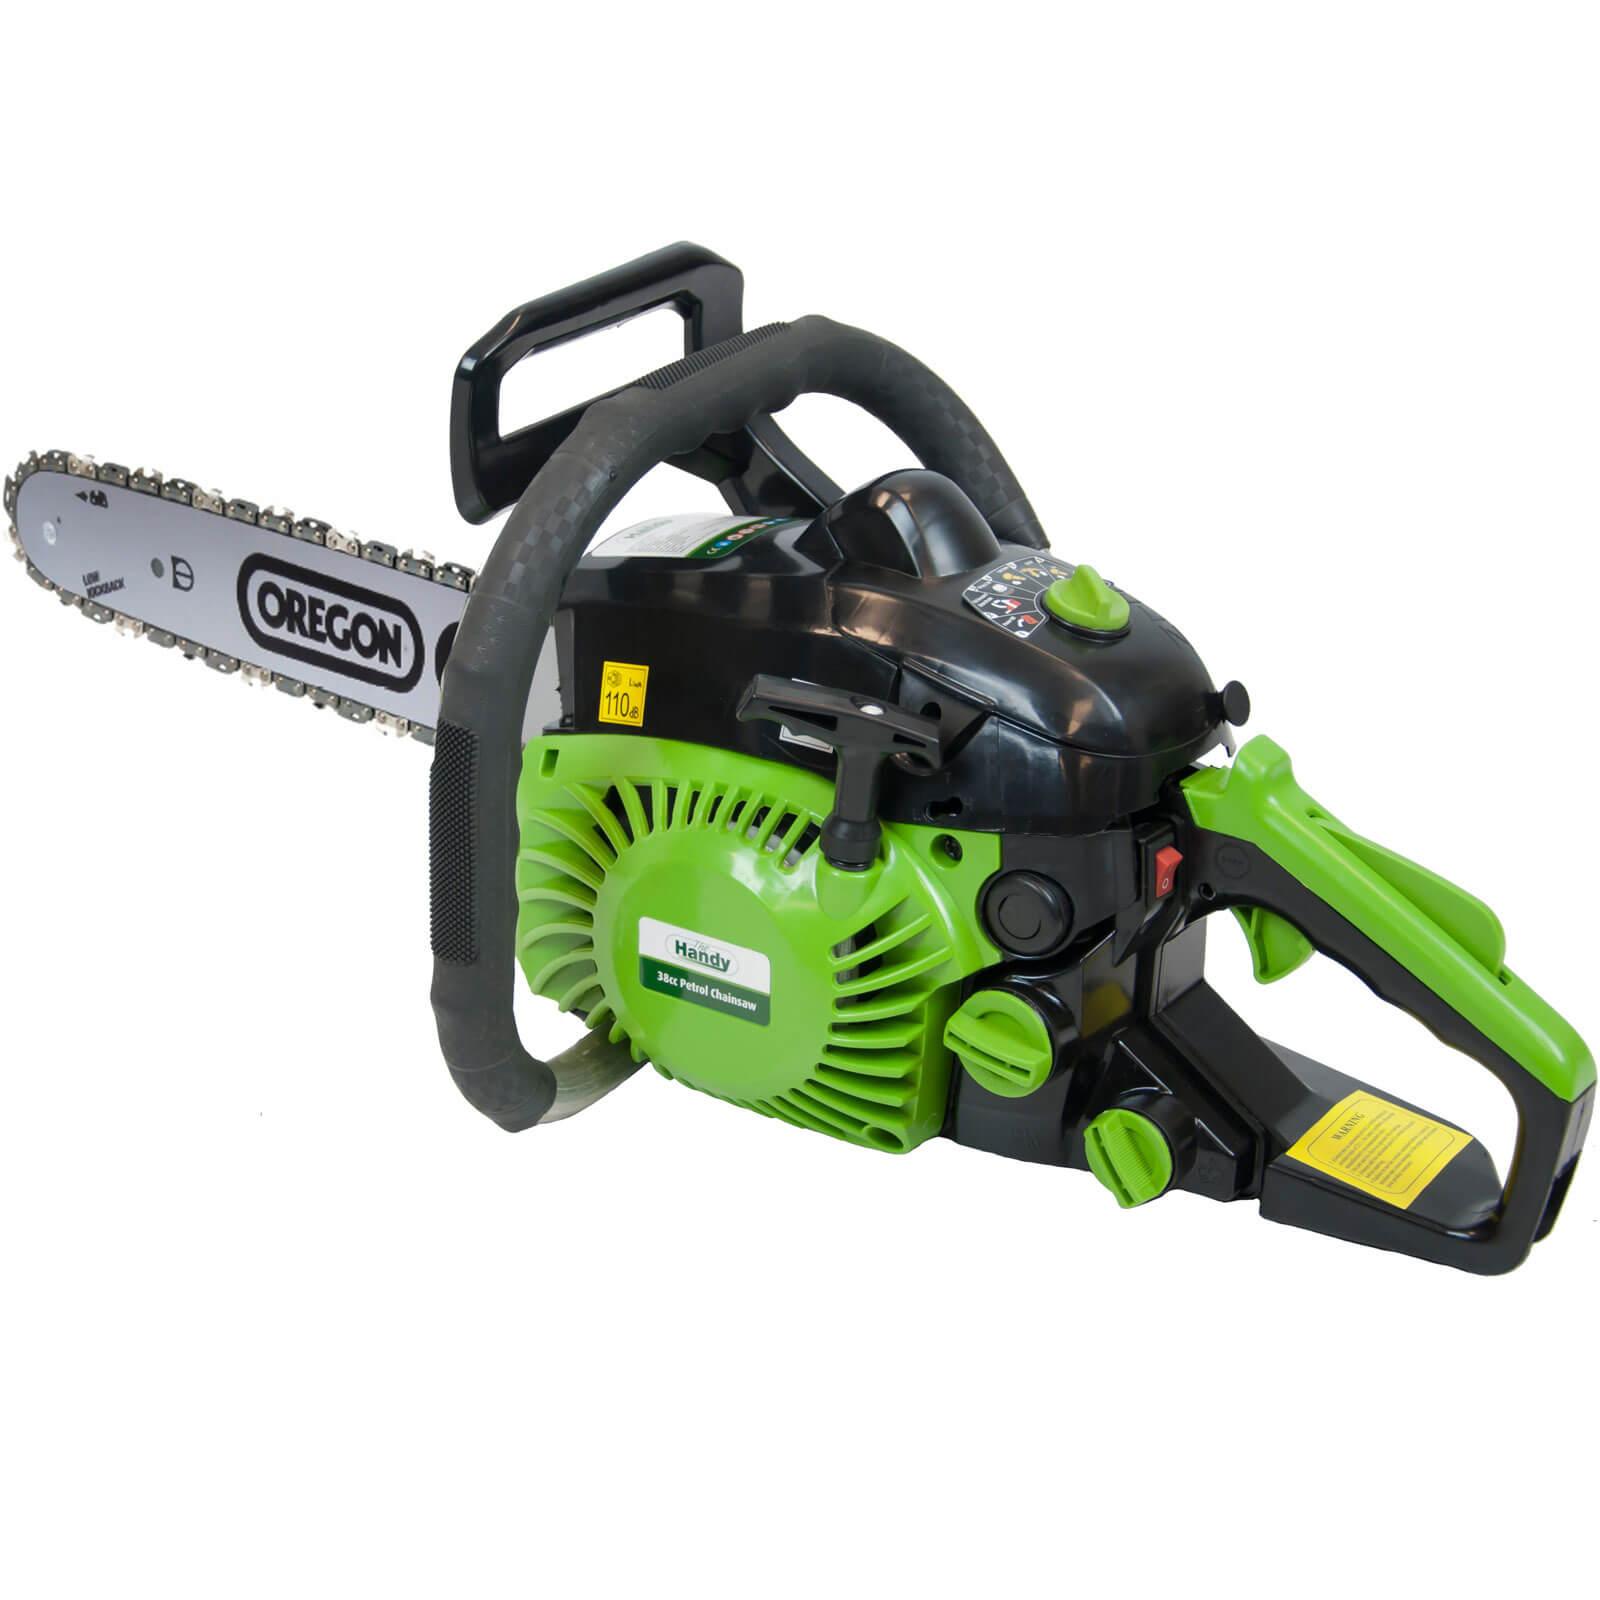 Handy Petrol Chain Saw 400mm / 16&quot Bar Length 38cc 2 Stroke Engine